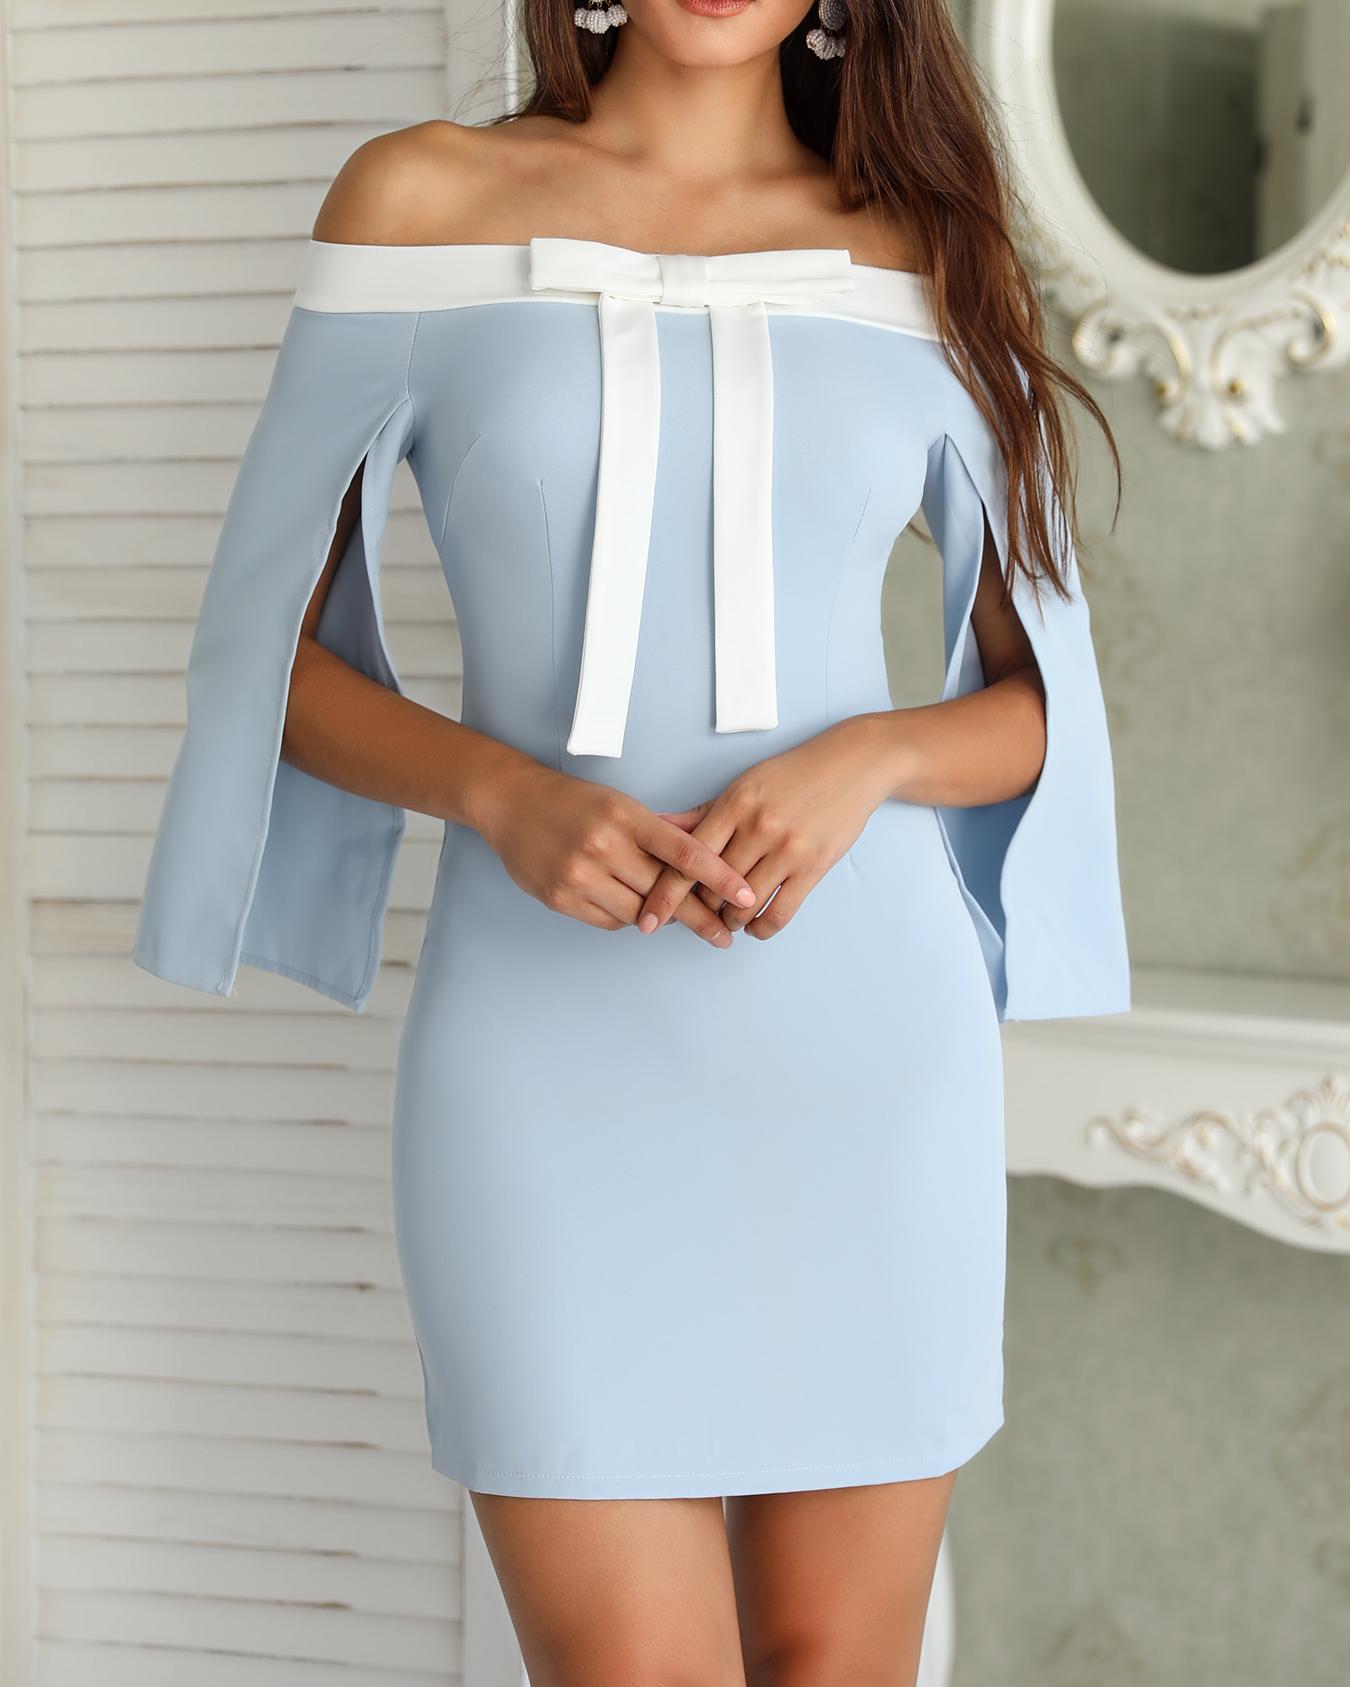 Off Shoulder Slit Sleeve Bow Front Bodycon Dress, Light blue